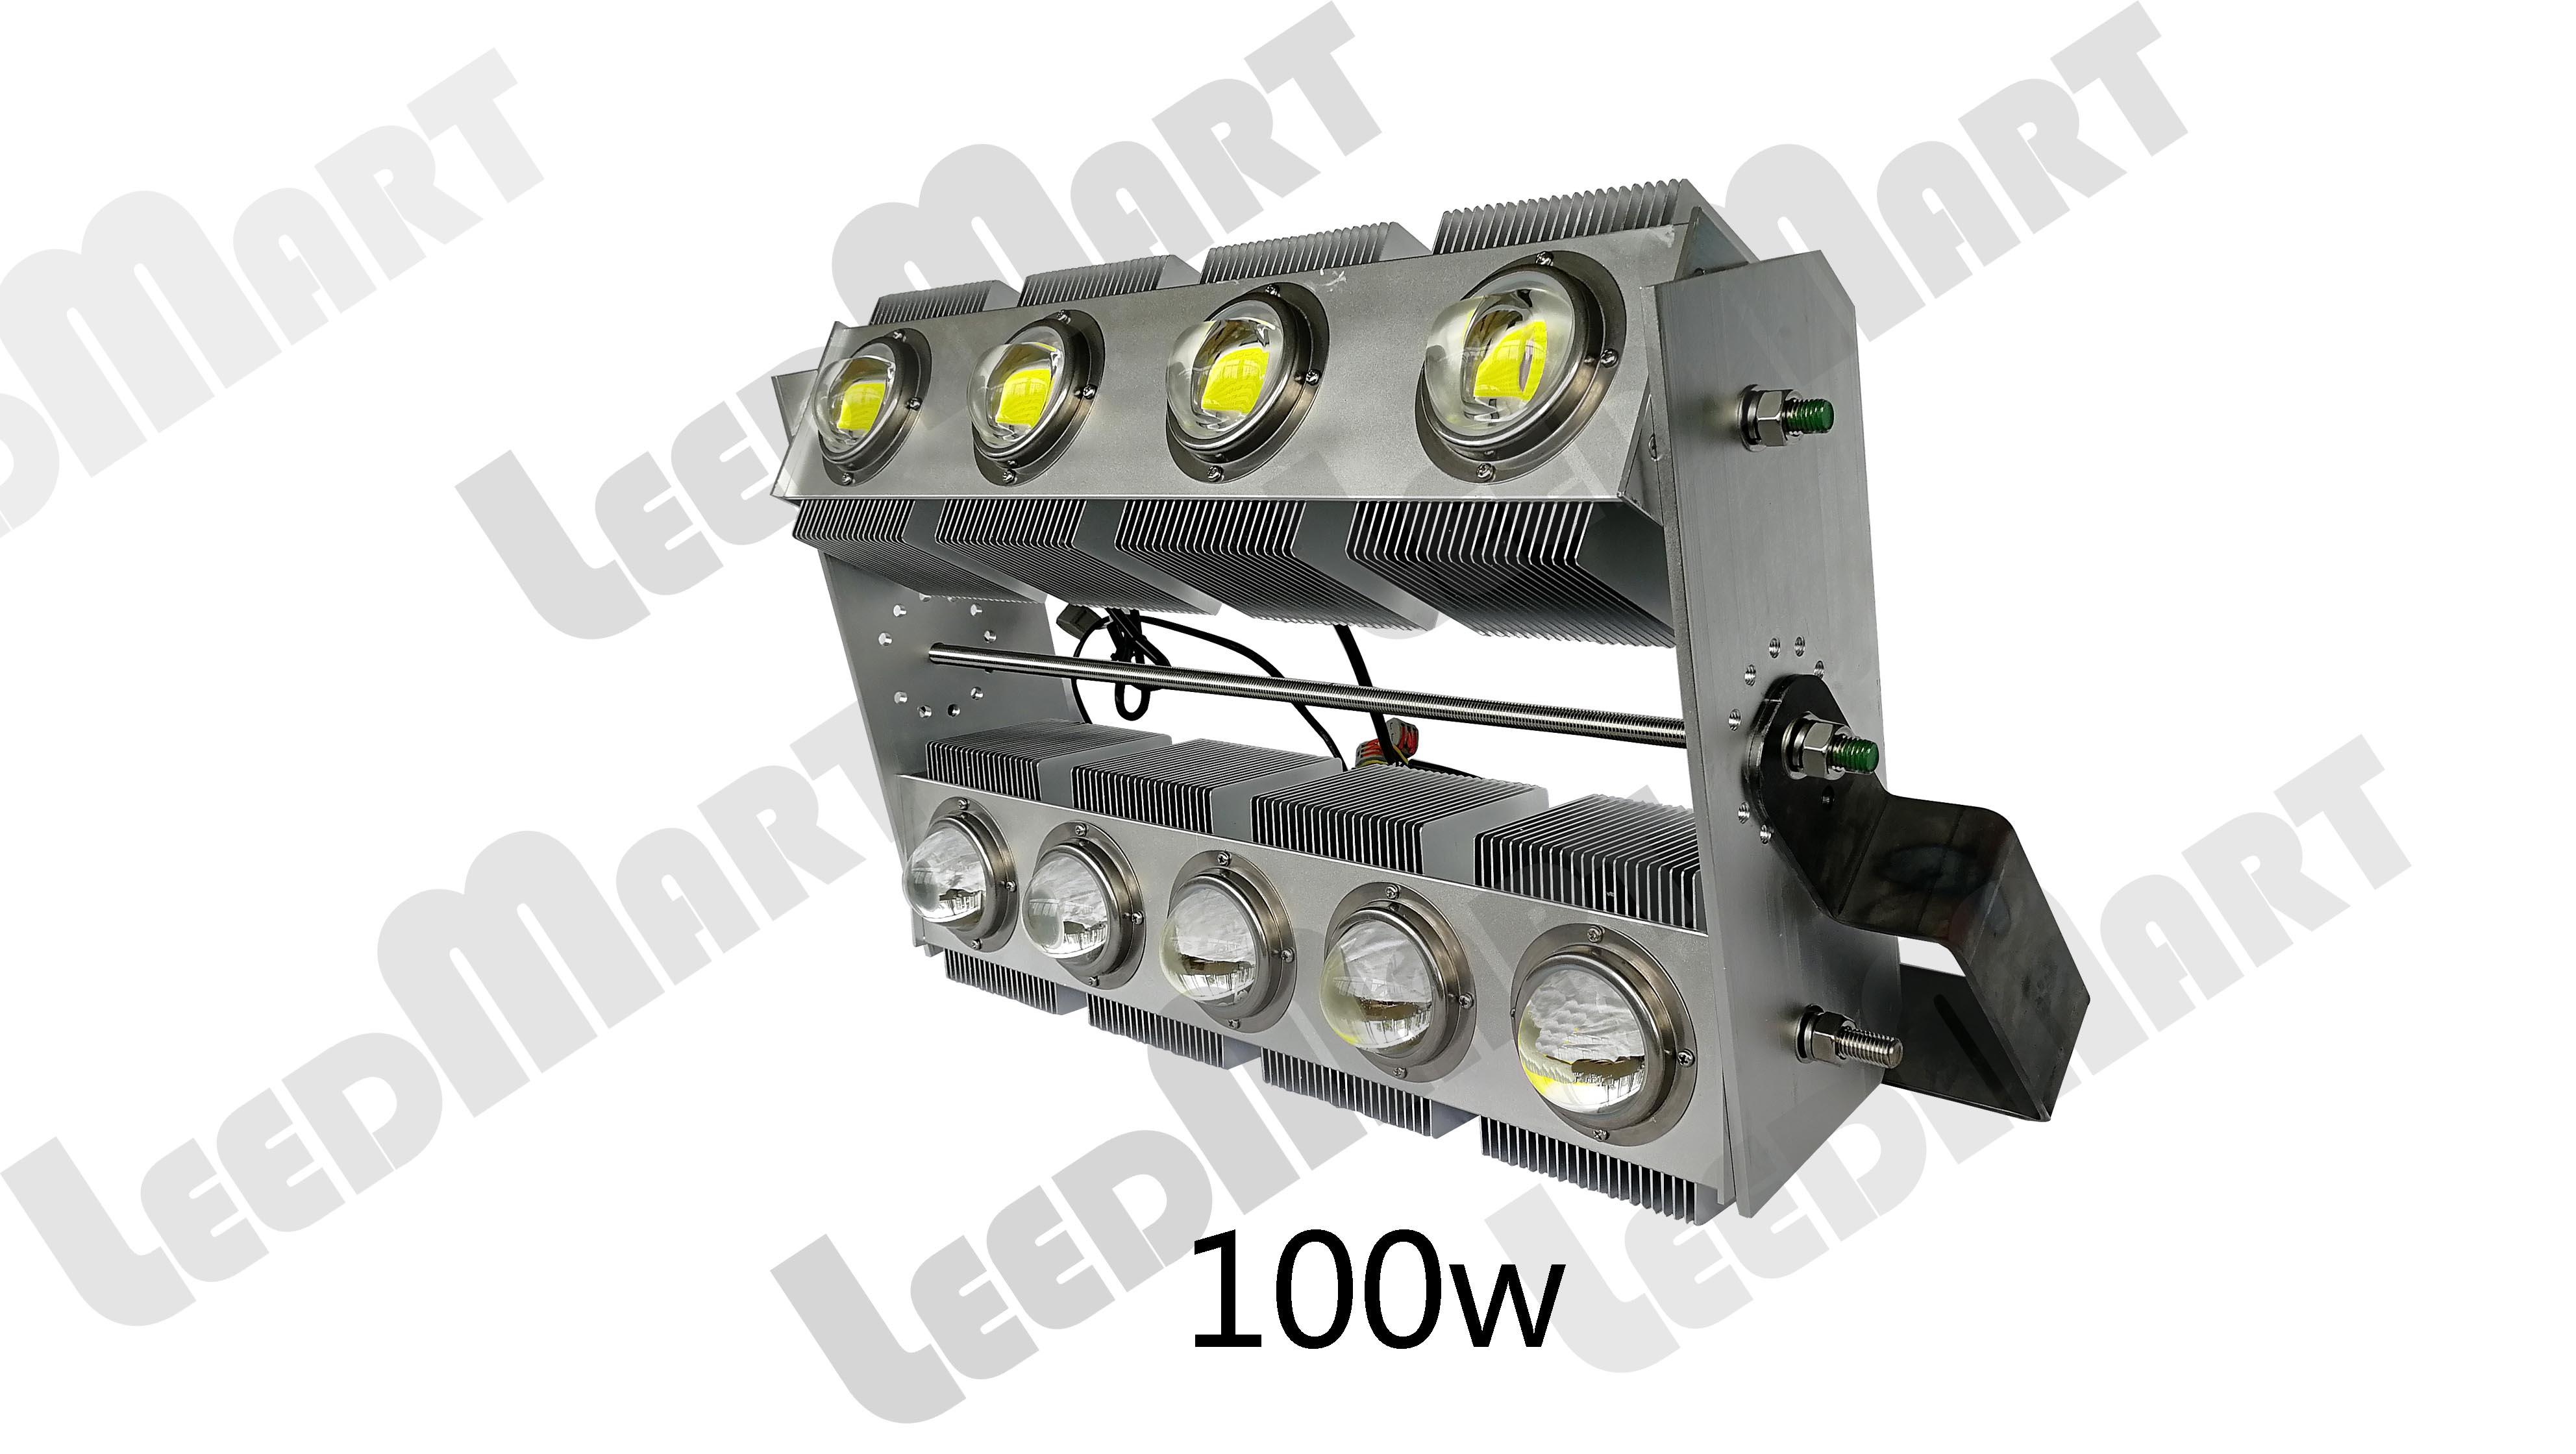 Rotatable LED billboard flood light IP65 indoor outdoor 50 watt -400 watt 48000 lumen innovative design